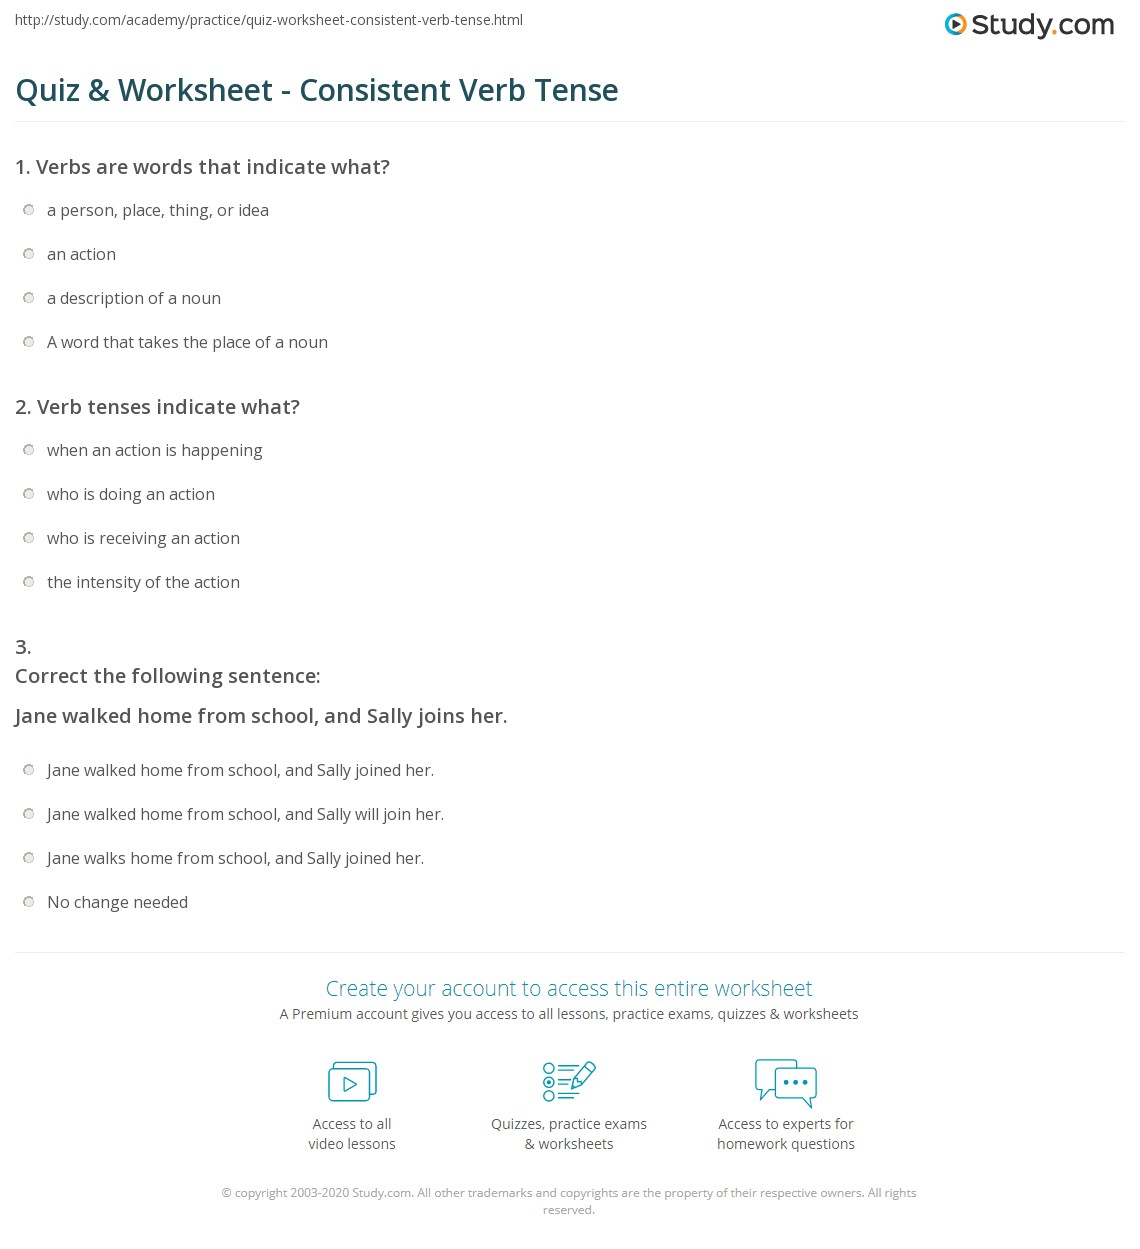 Consistent Verb Tense Worksheet jannatulduniya – Verb Tenses Worksheet